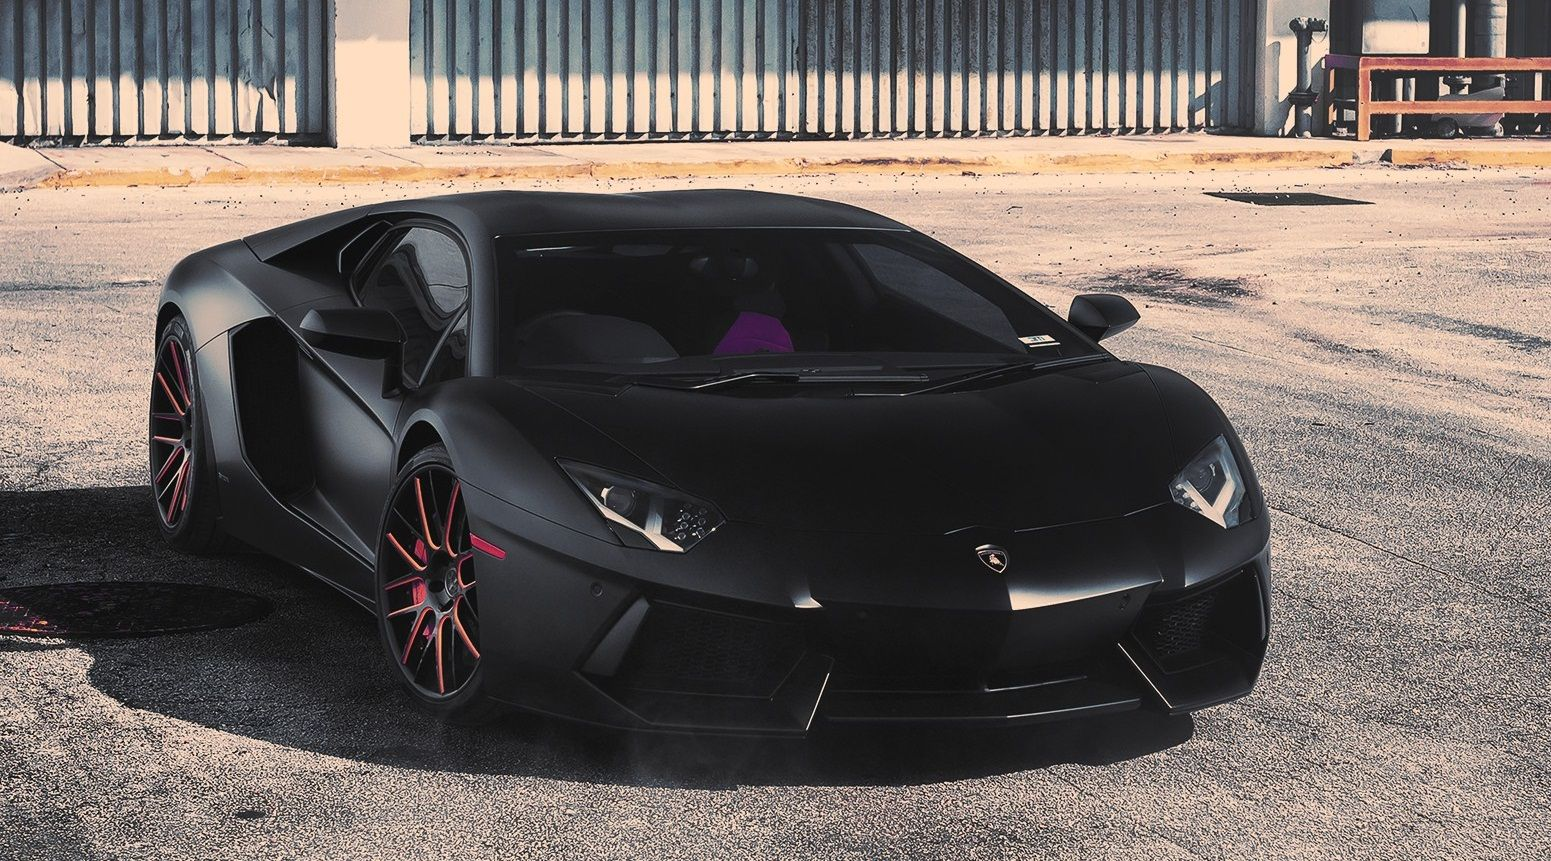 lamborghini aventador 2015 black lamborghini aventador - Lamborghini Aventador 2015 Black